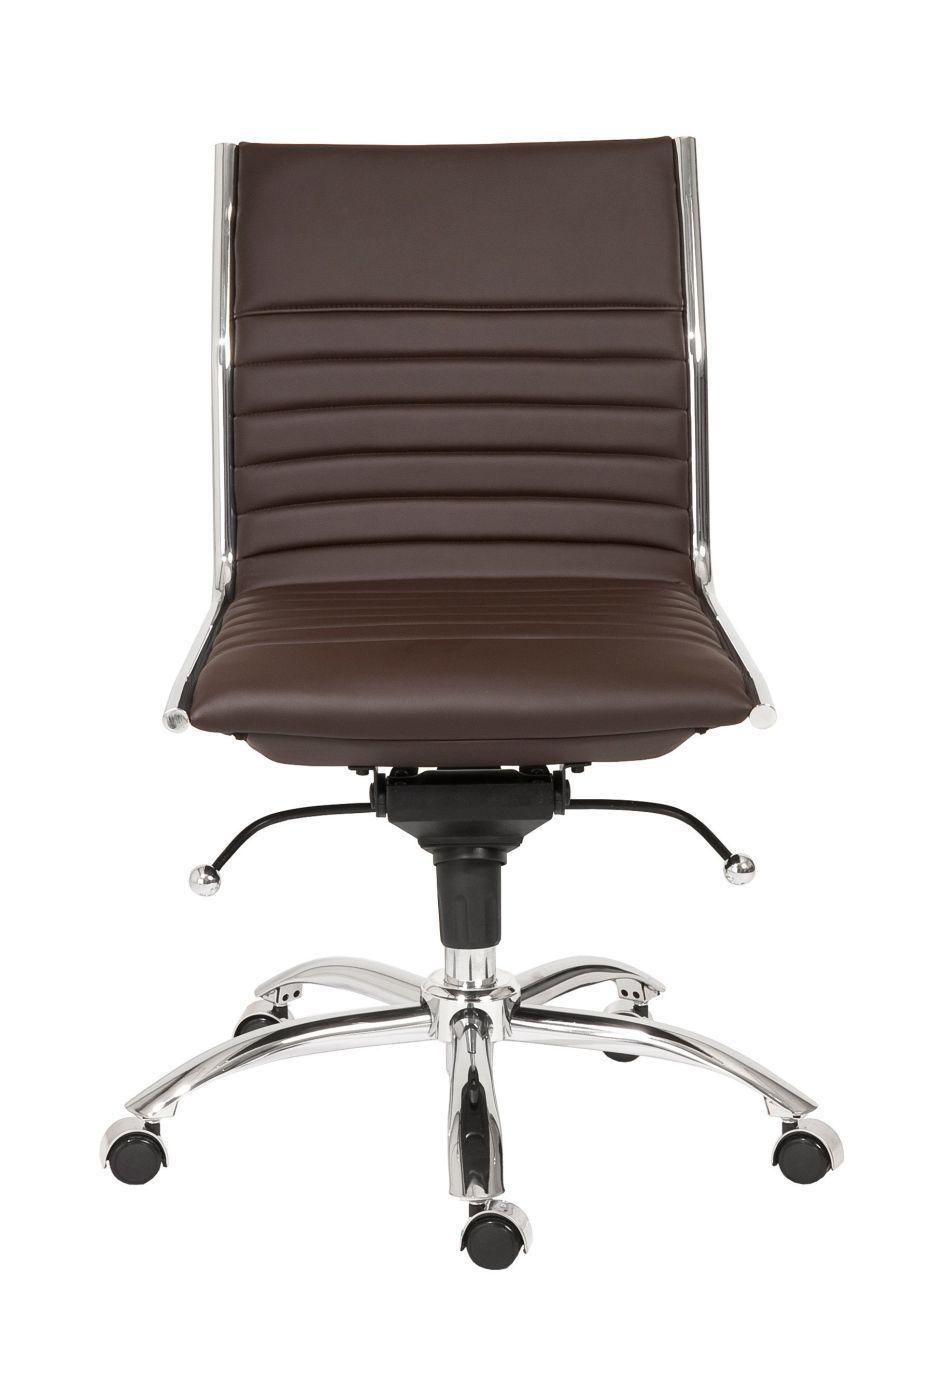 Buy euro style euro01266brn dirk low back office chair